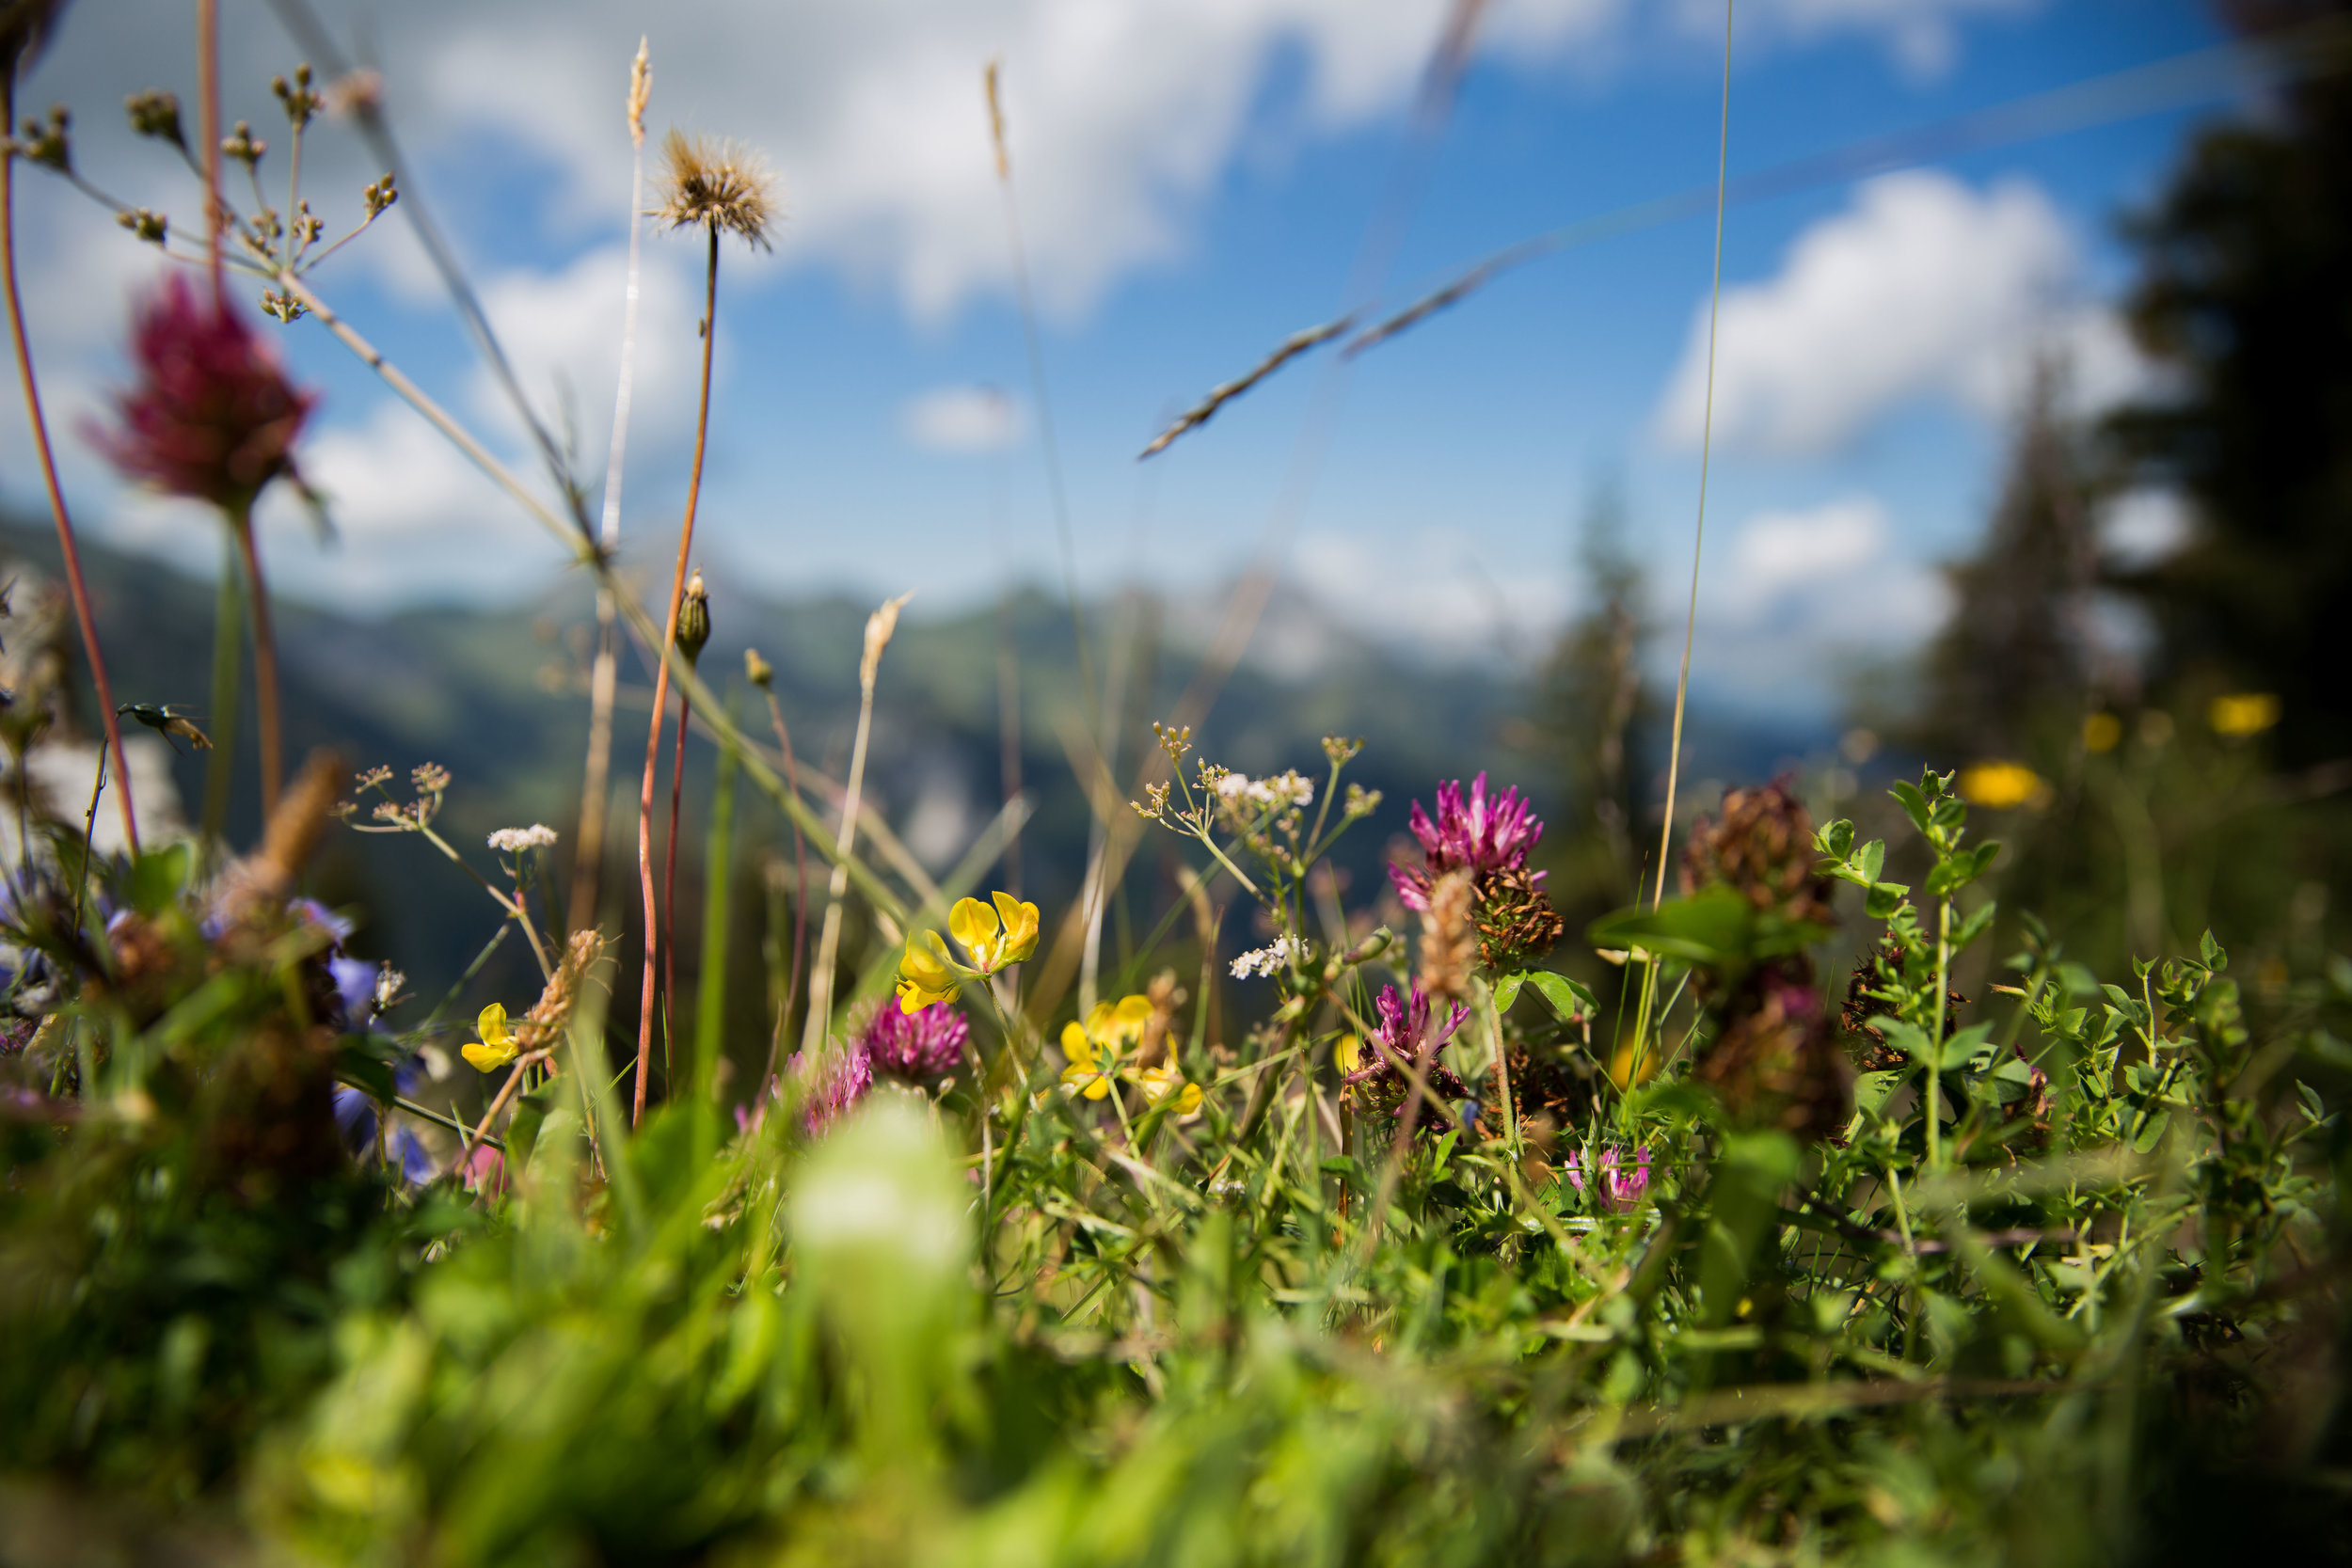 NickHopper_LeGrandBellevue_Gstaad-7243.jpg